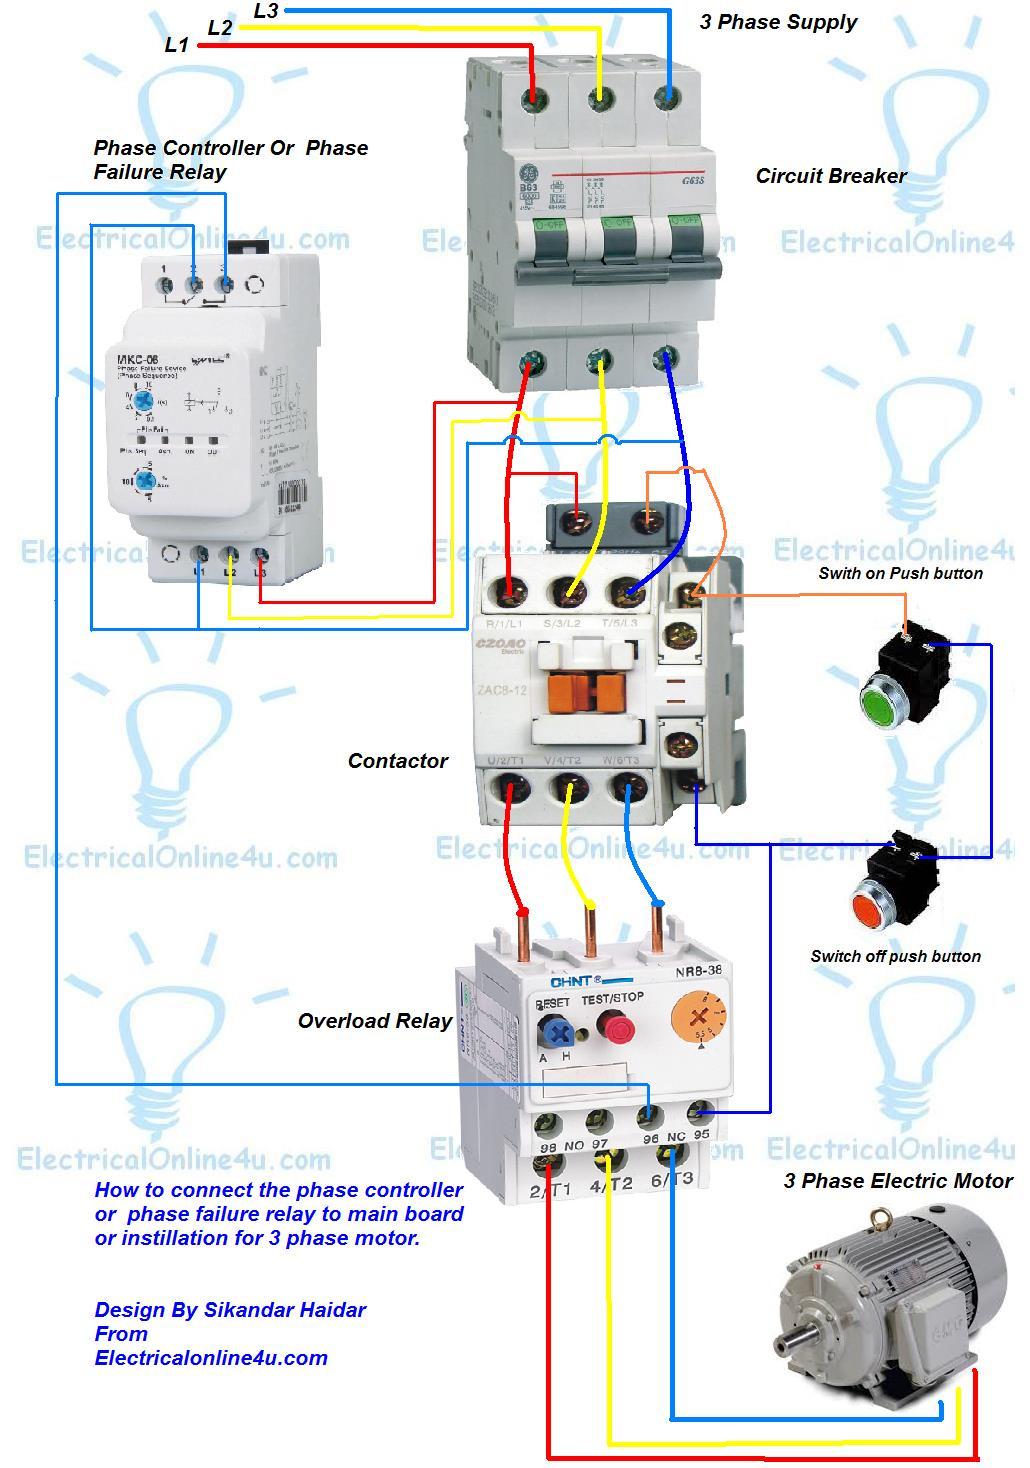 medium resolution of 3 phase motor wiring diagram 120 volt control wiring diagram 3 phase motor wiring diagram 120 volt control